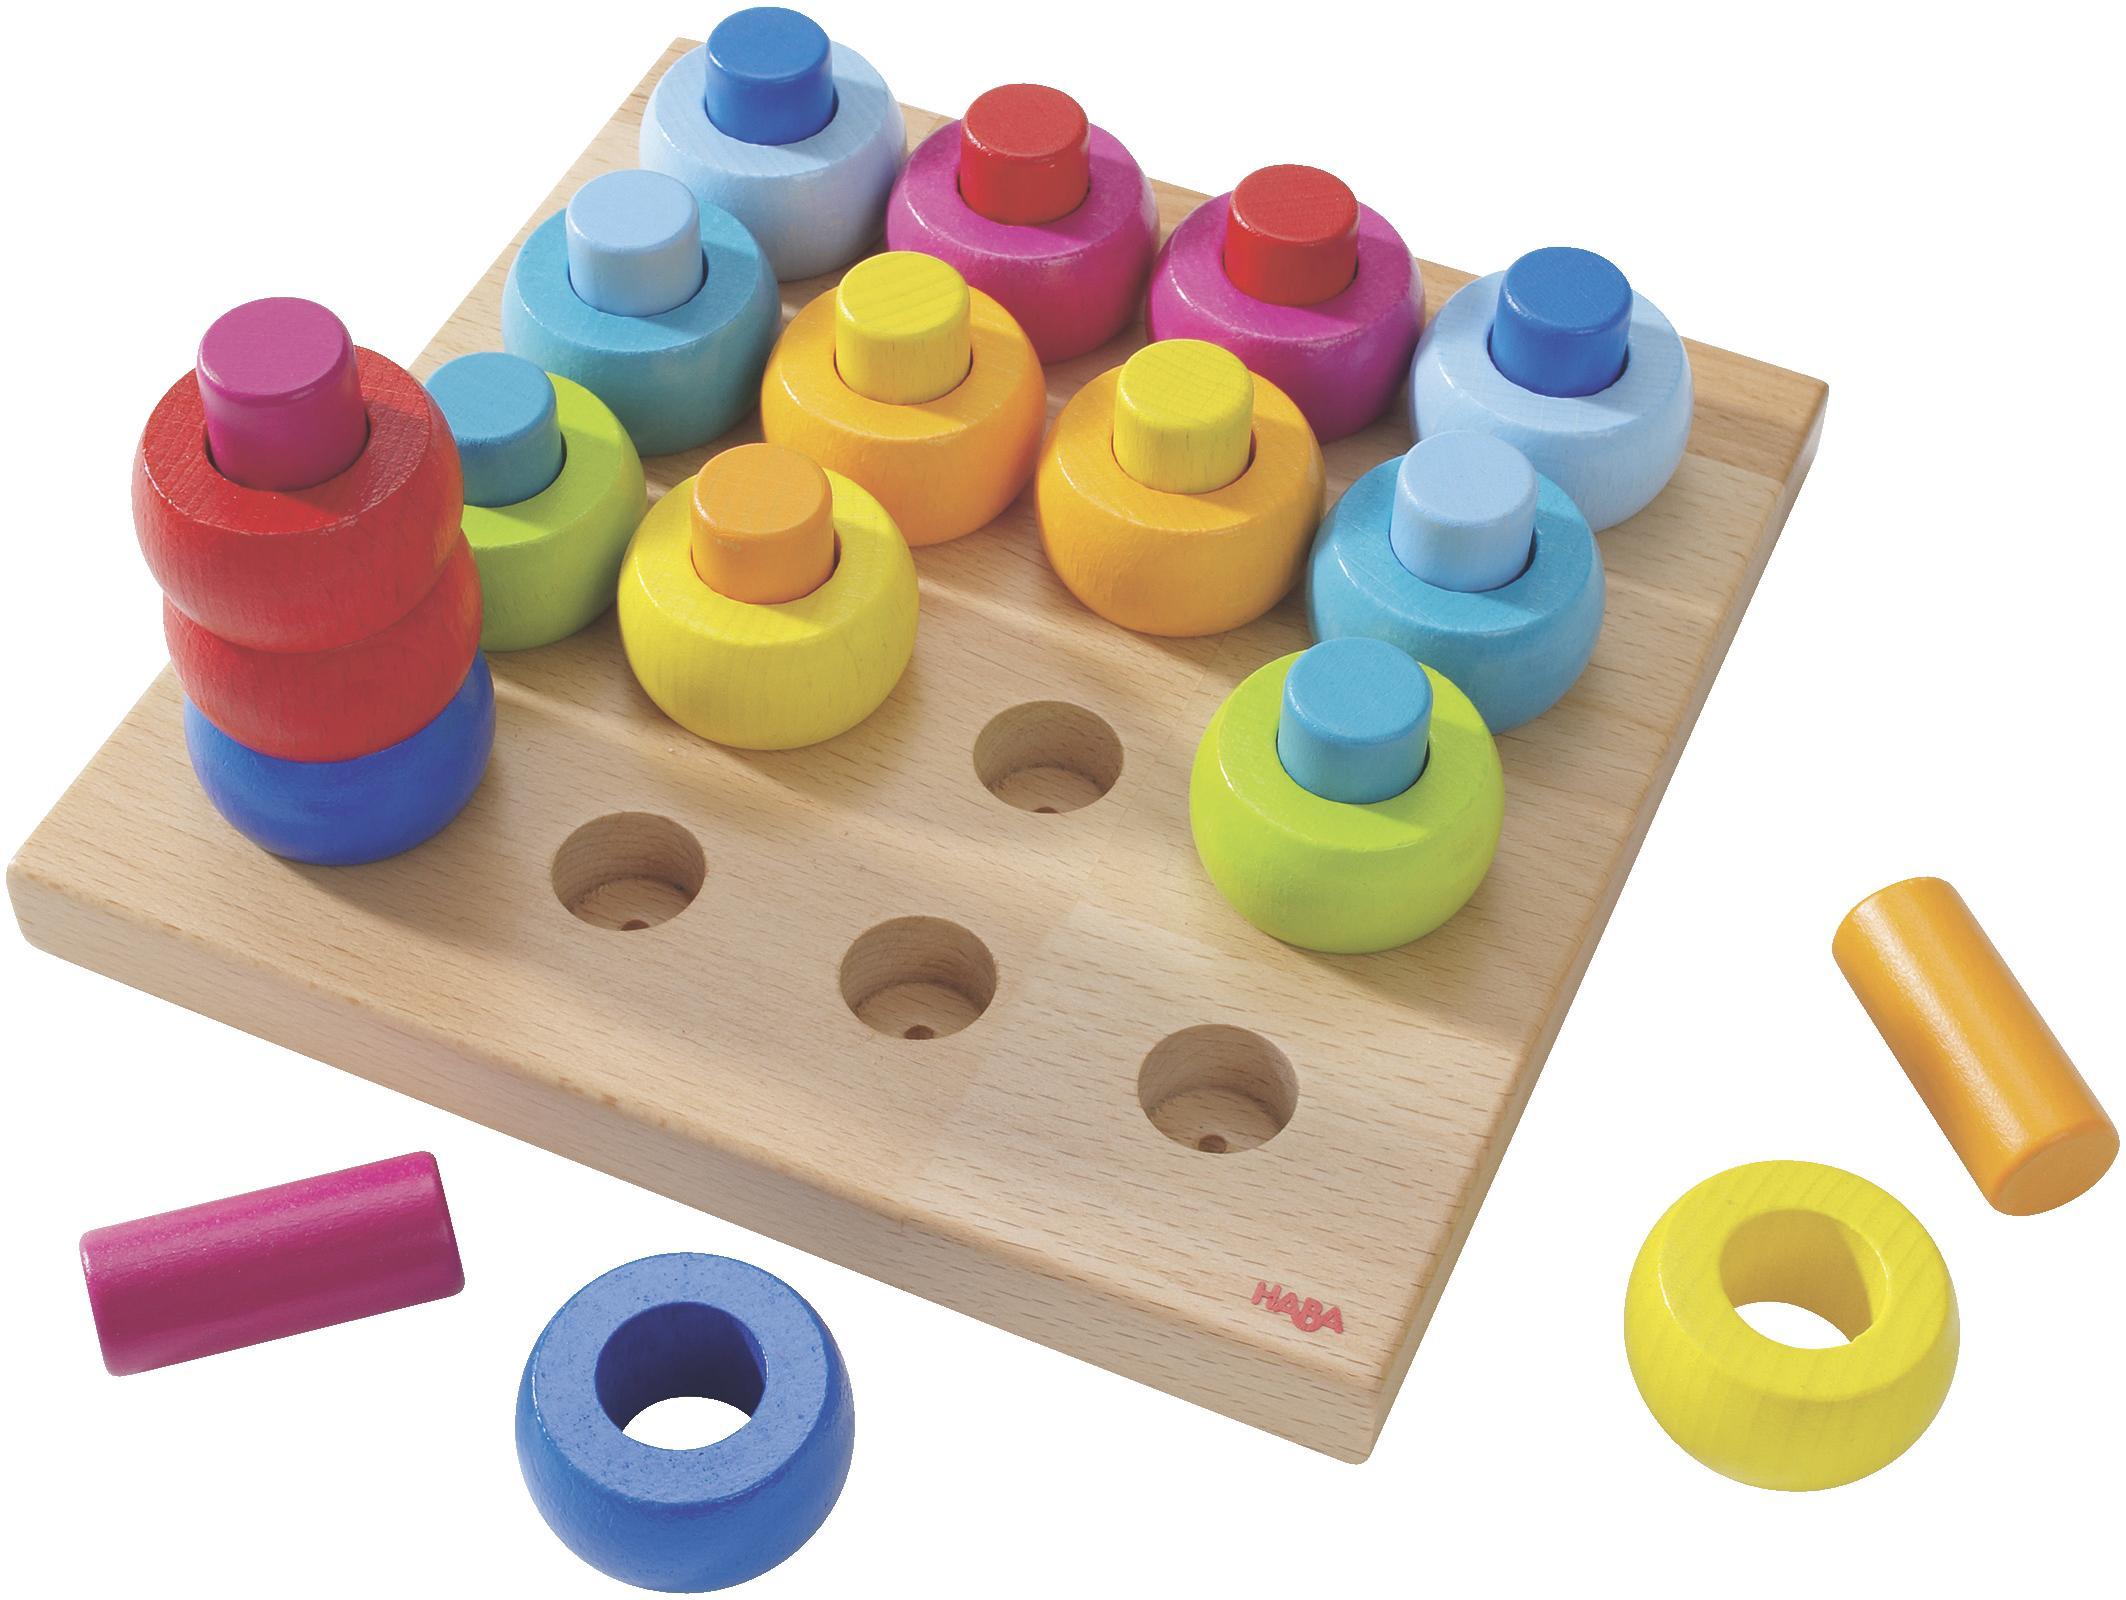 Haba Steckspielzeug Farbkringel, Made in Germany bunt Kinder Holzspielzeug